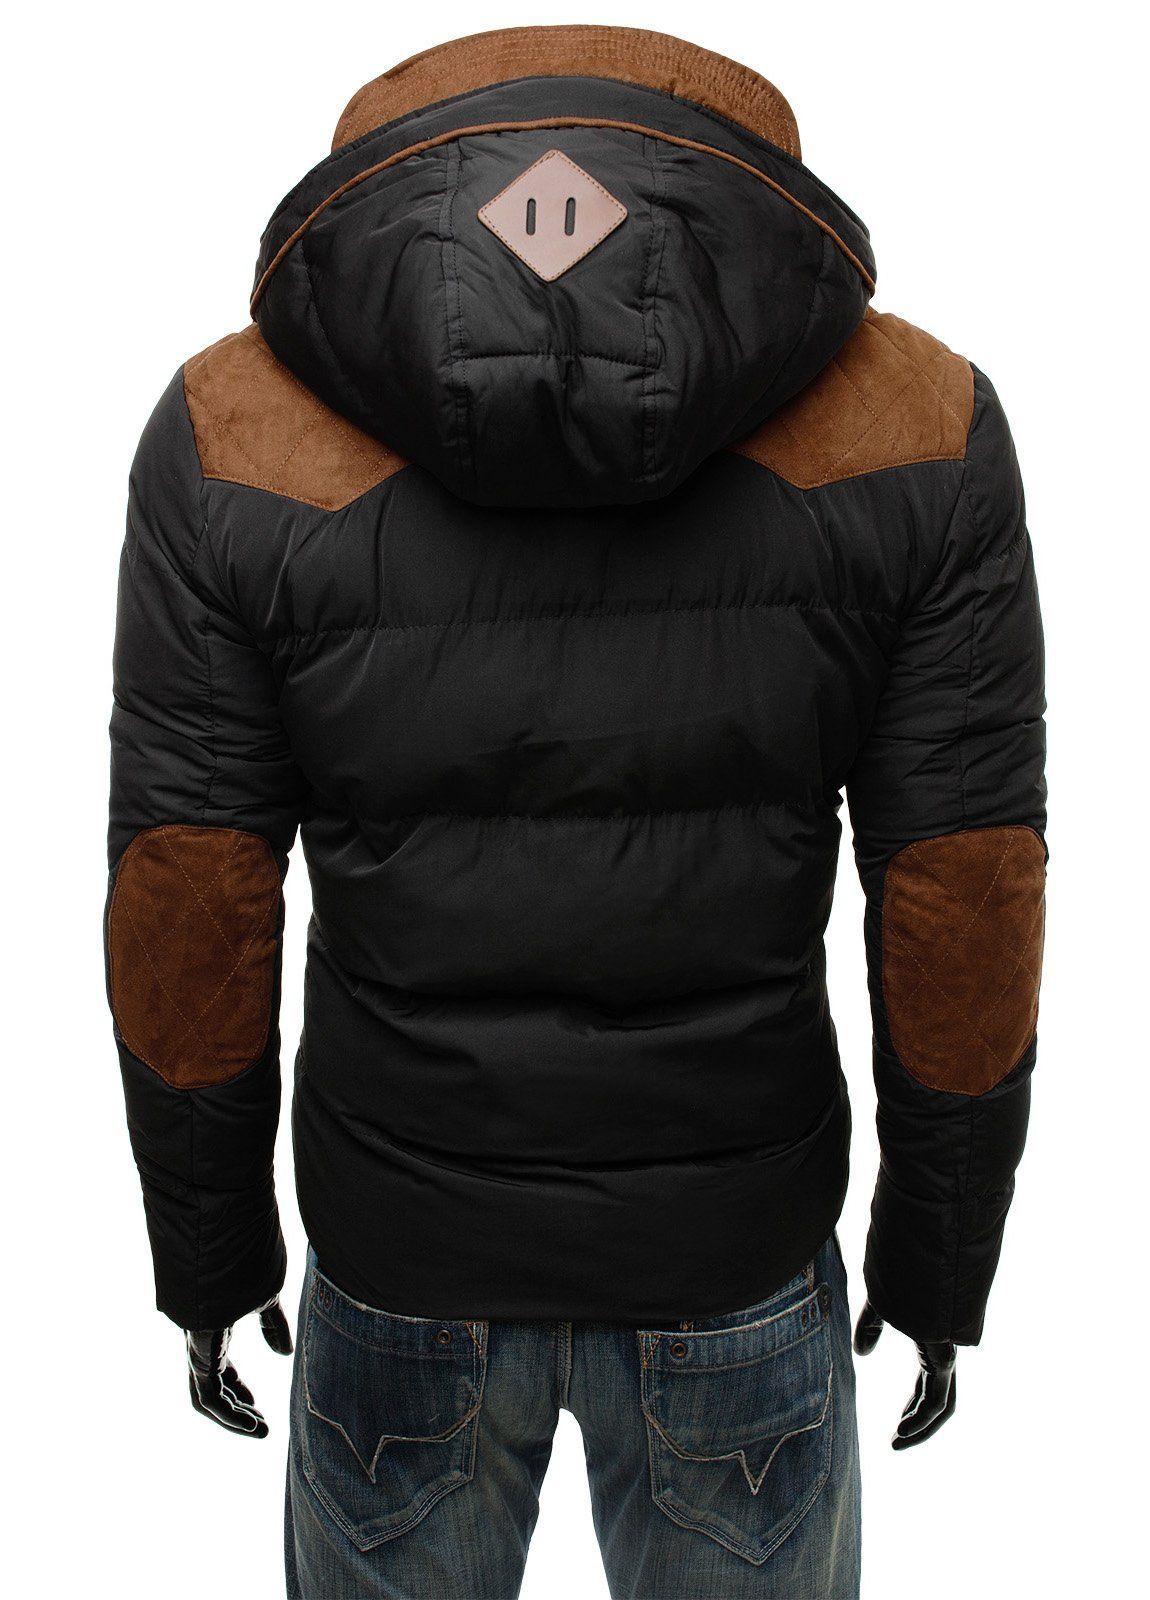 OZONEE Herren Jacke Warme Winterjacke Steppjacke mit Kapuze